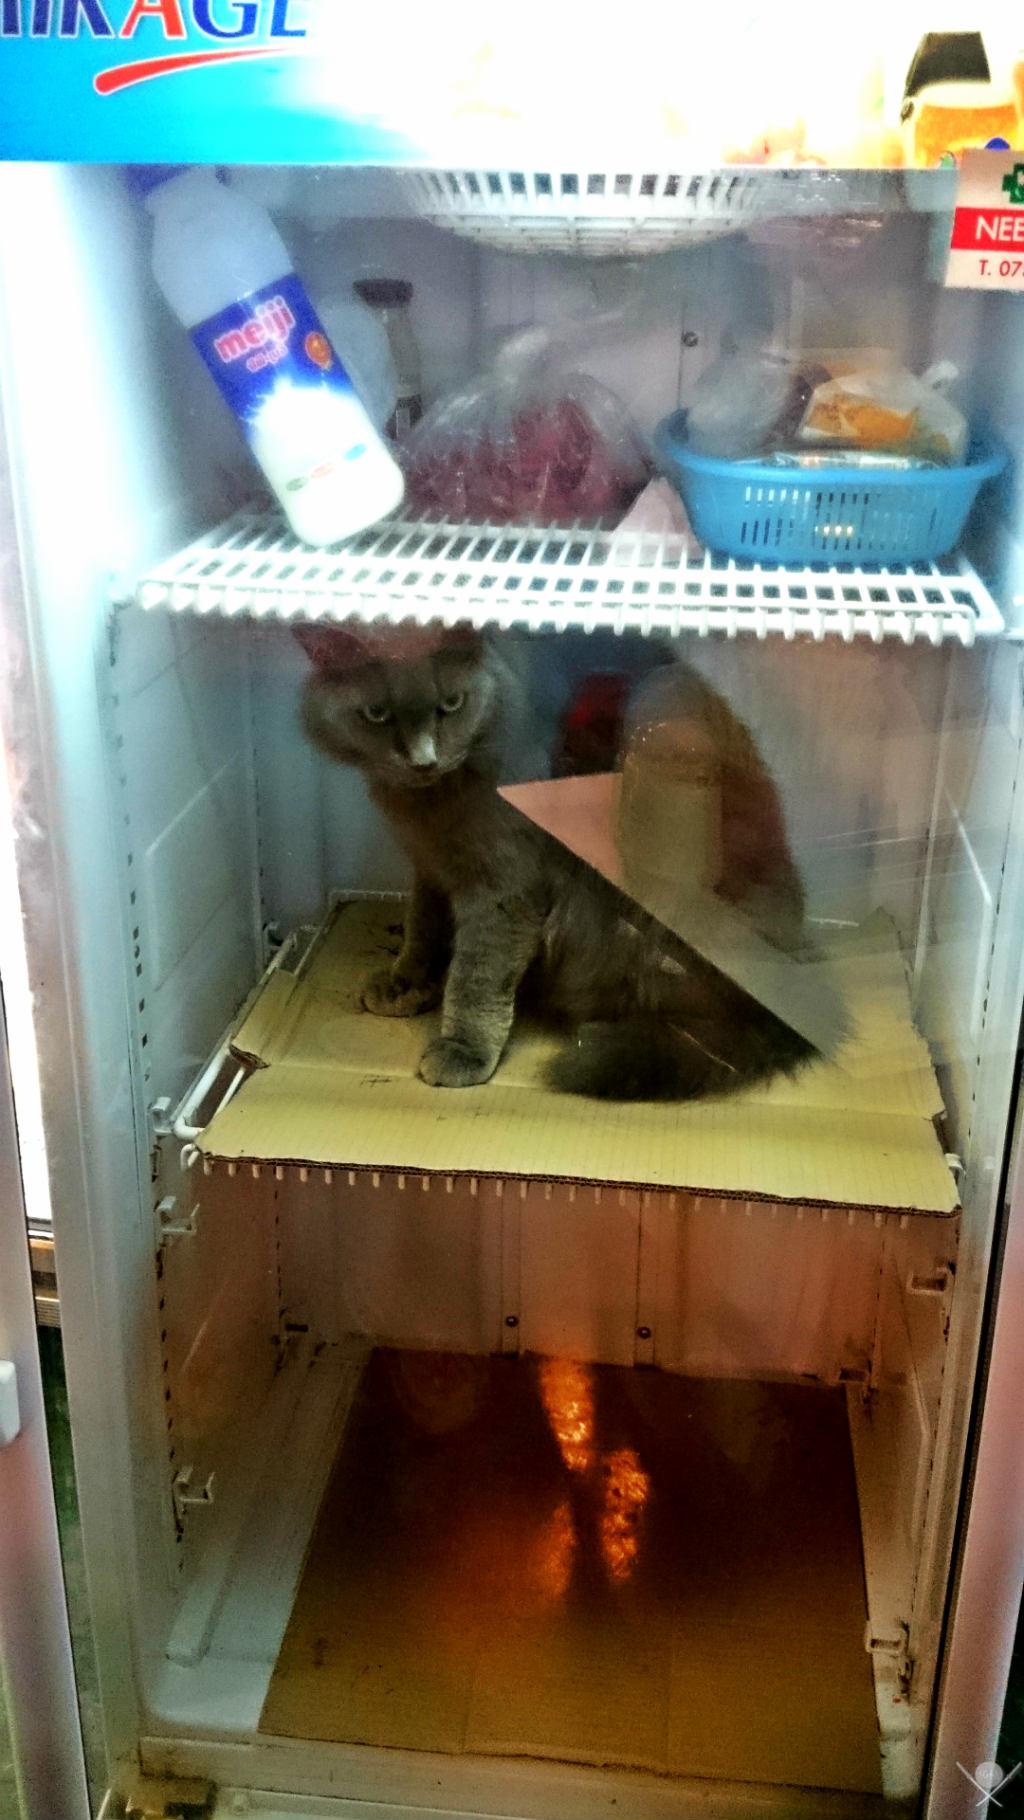 Thailand - Koh Phi Phi - Gatos na geladeira - Vida de Tsuge - VDT